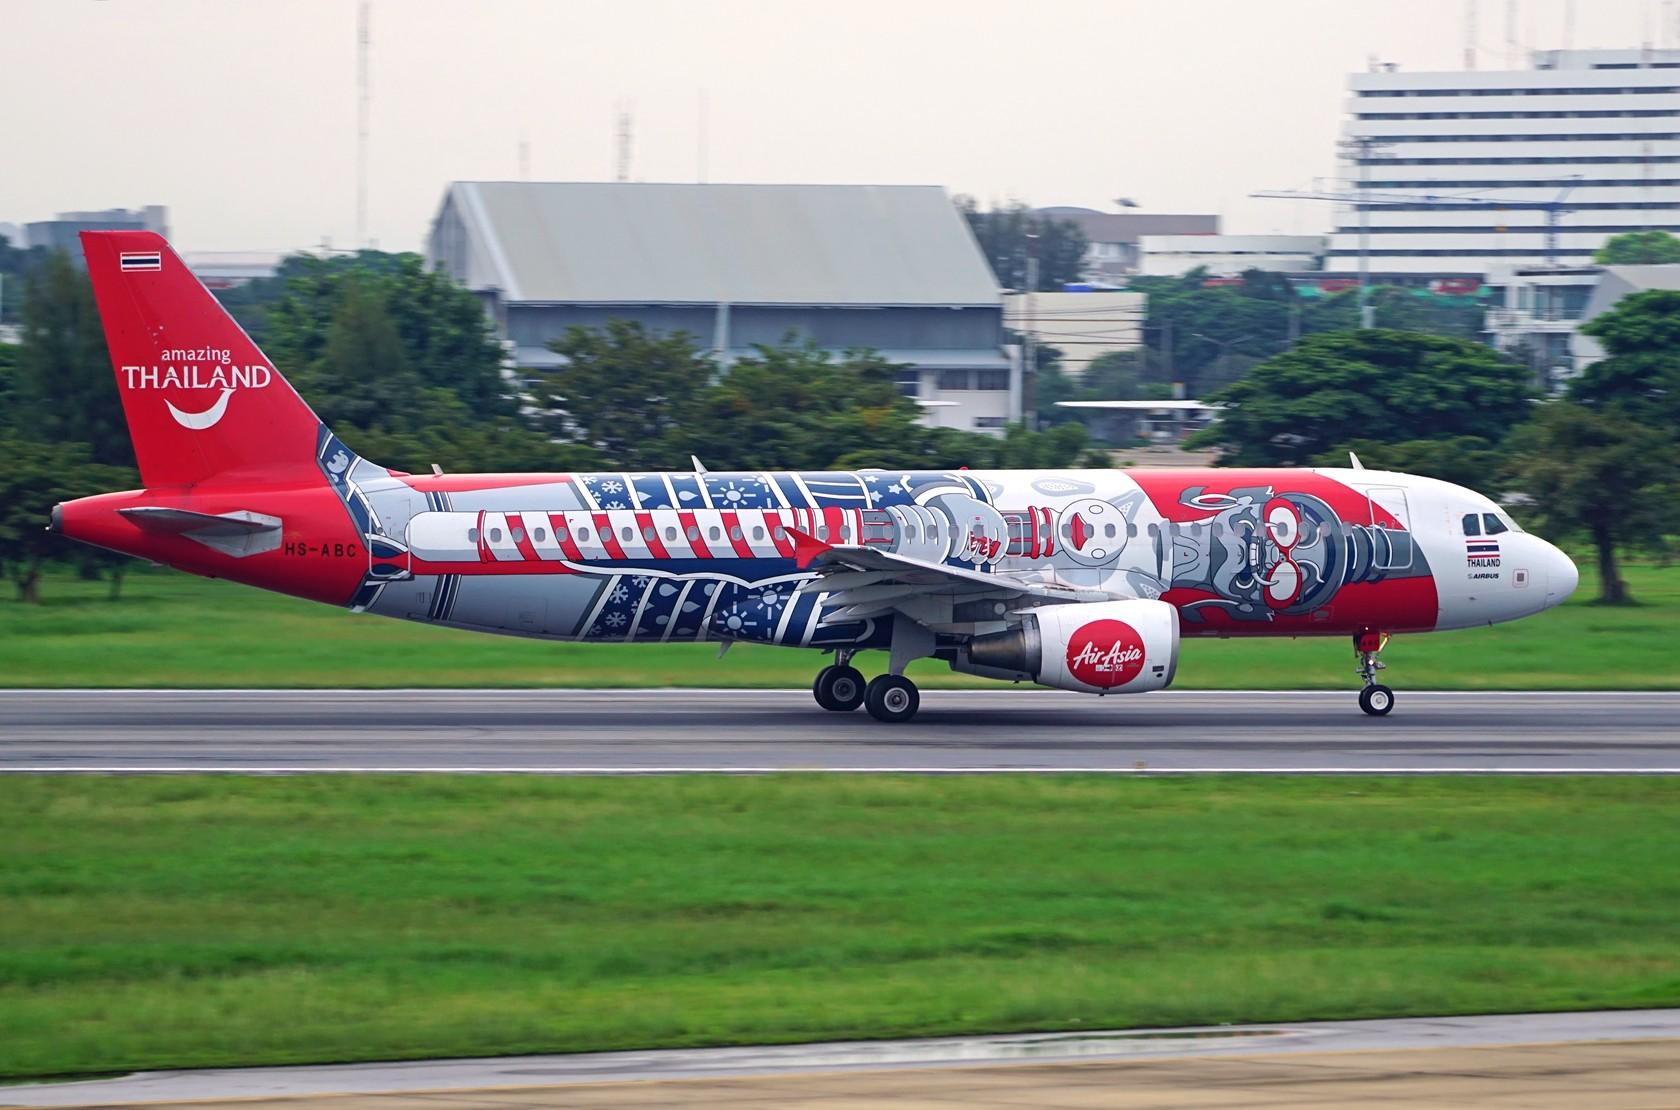 Re:[原创]泰国亚洲航空彩绘 门神+缤纷泰国 AIRBUS A320-200 HS-ABC 泰国曼谷廊曼国际机场